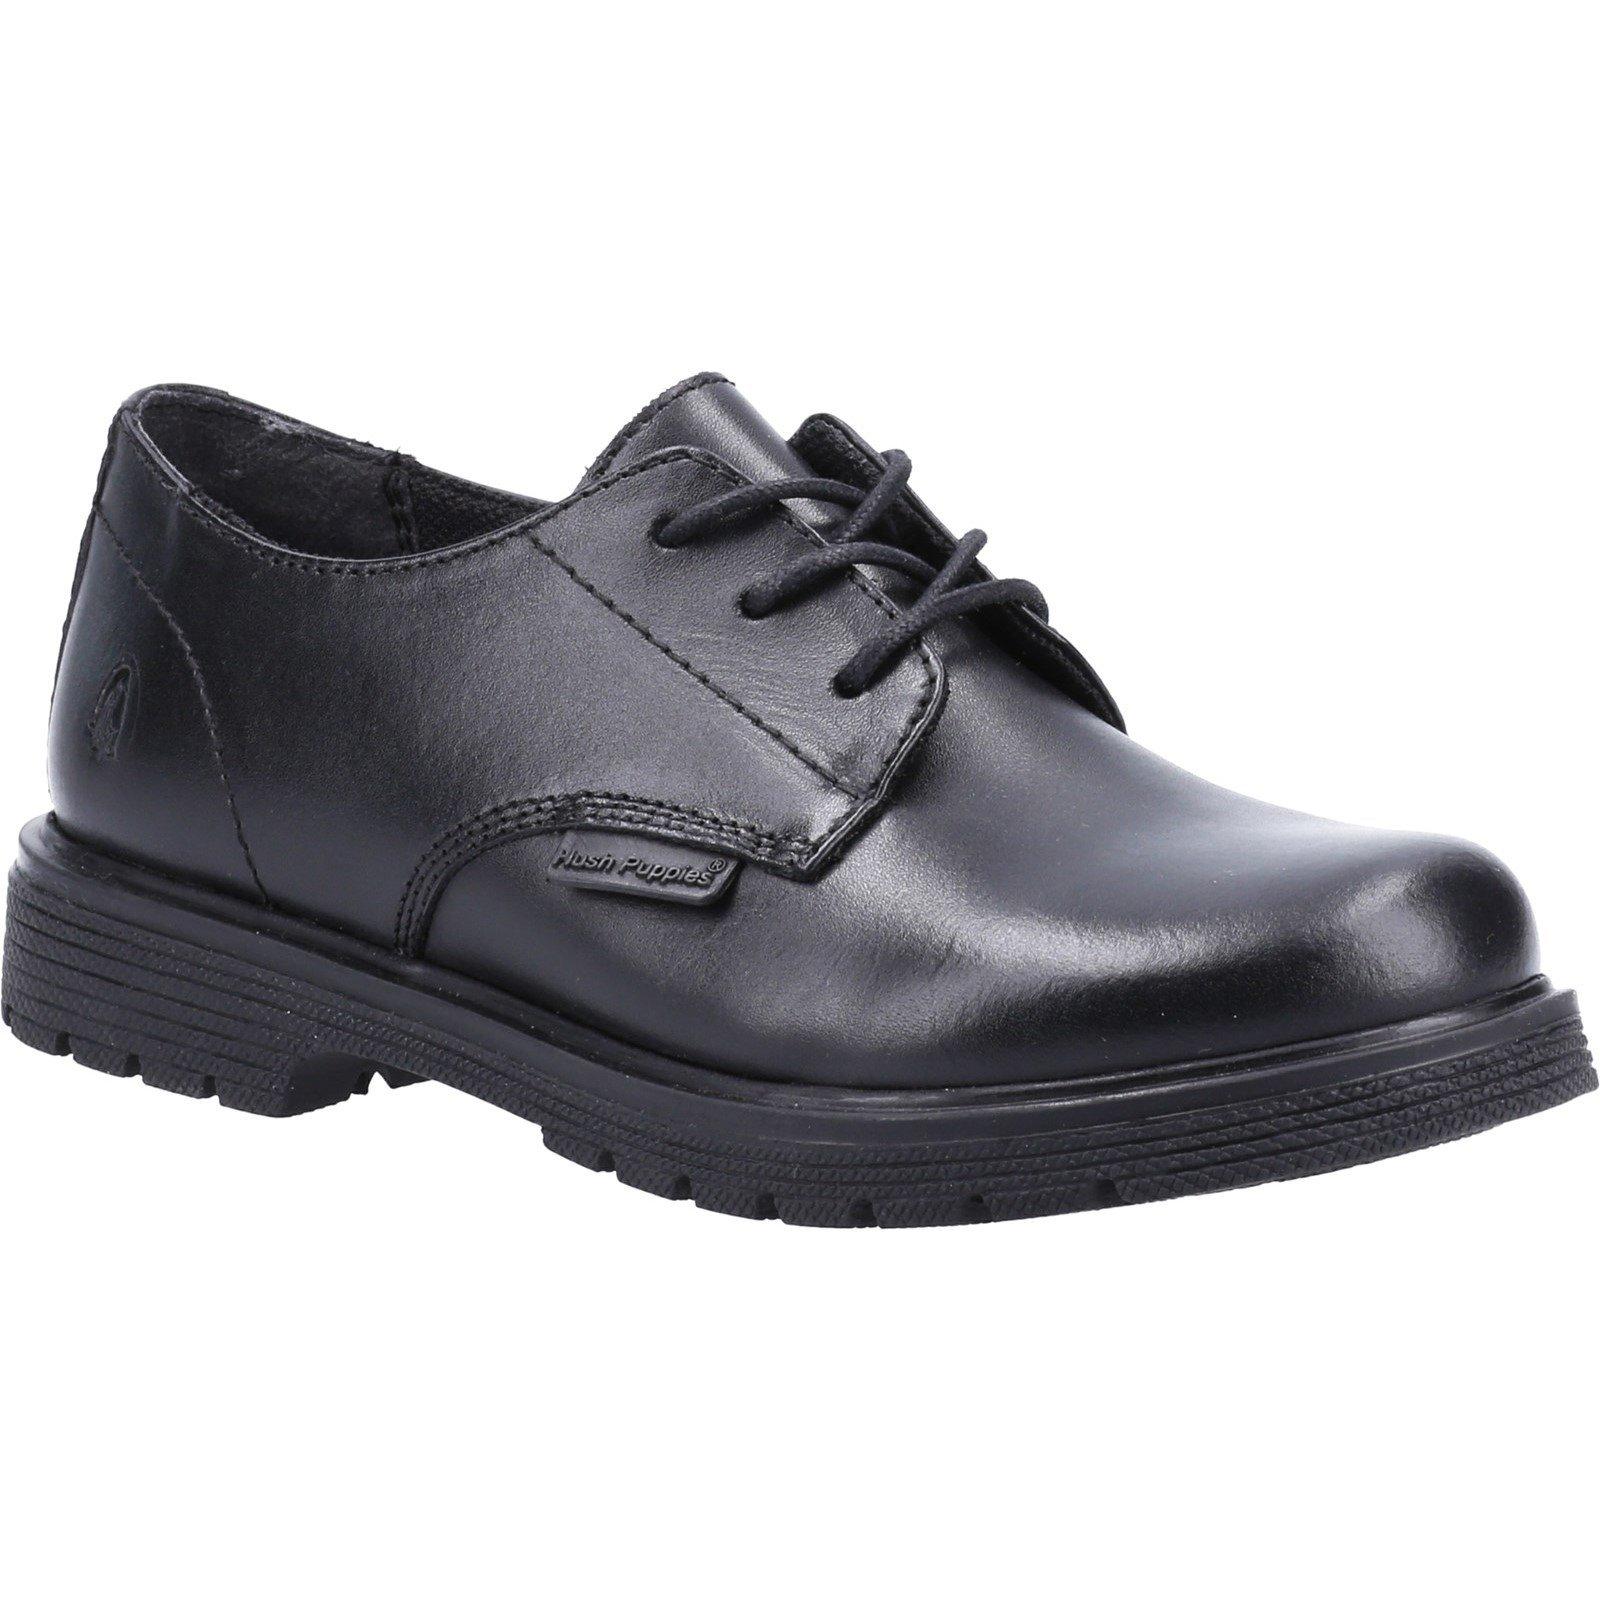 Hush Puppies Kid's Remi Junior School Derby Shoes Black 32612 - Black 1